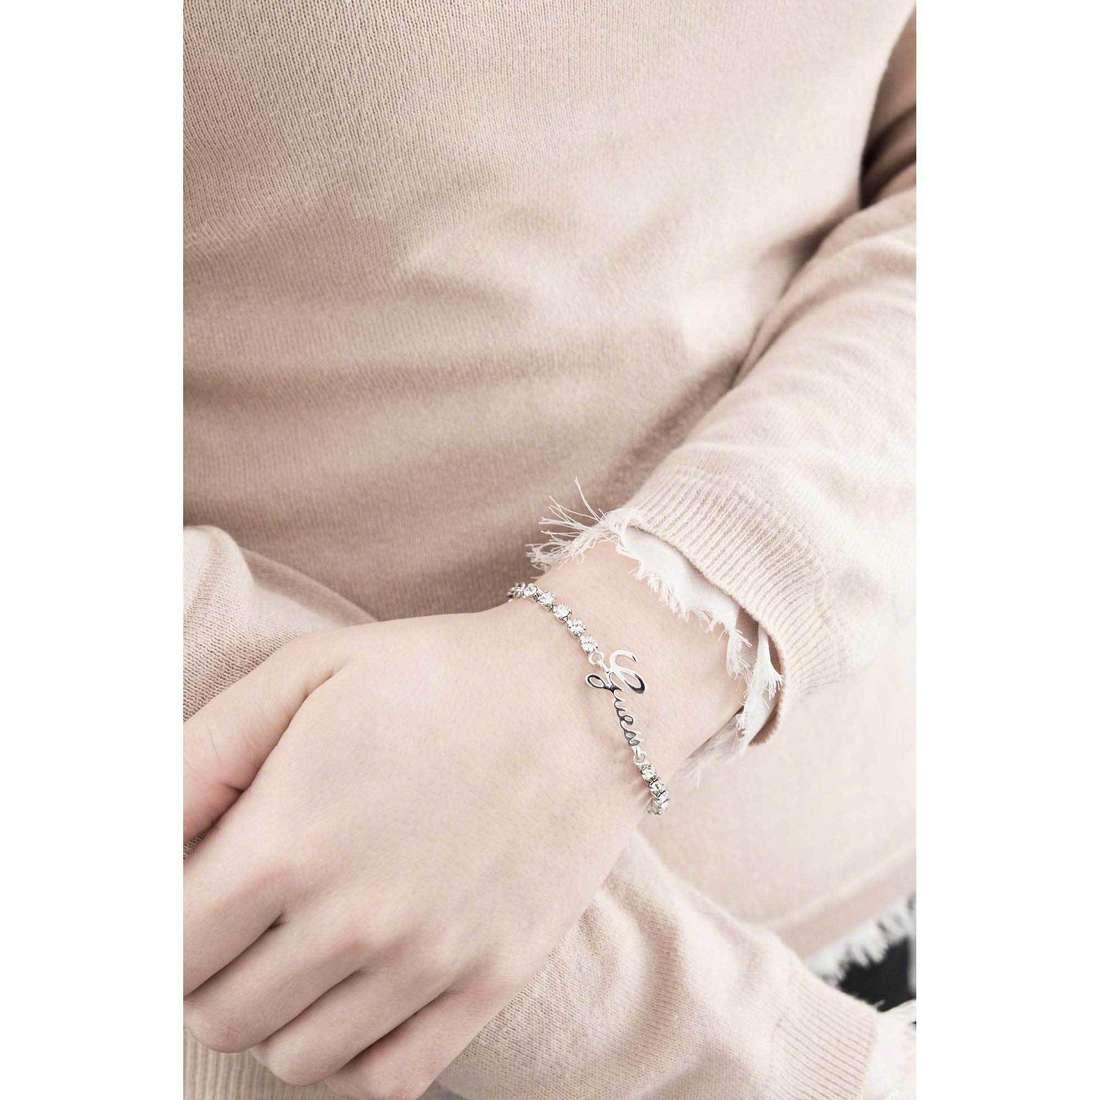 Guess bracciali Boxset donna UBS21501-S indosso